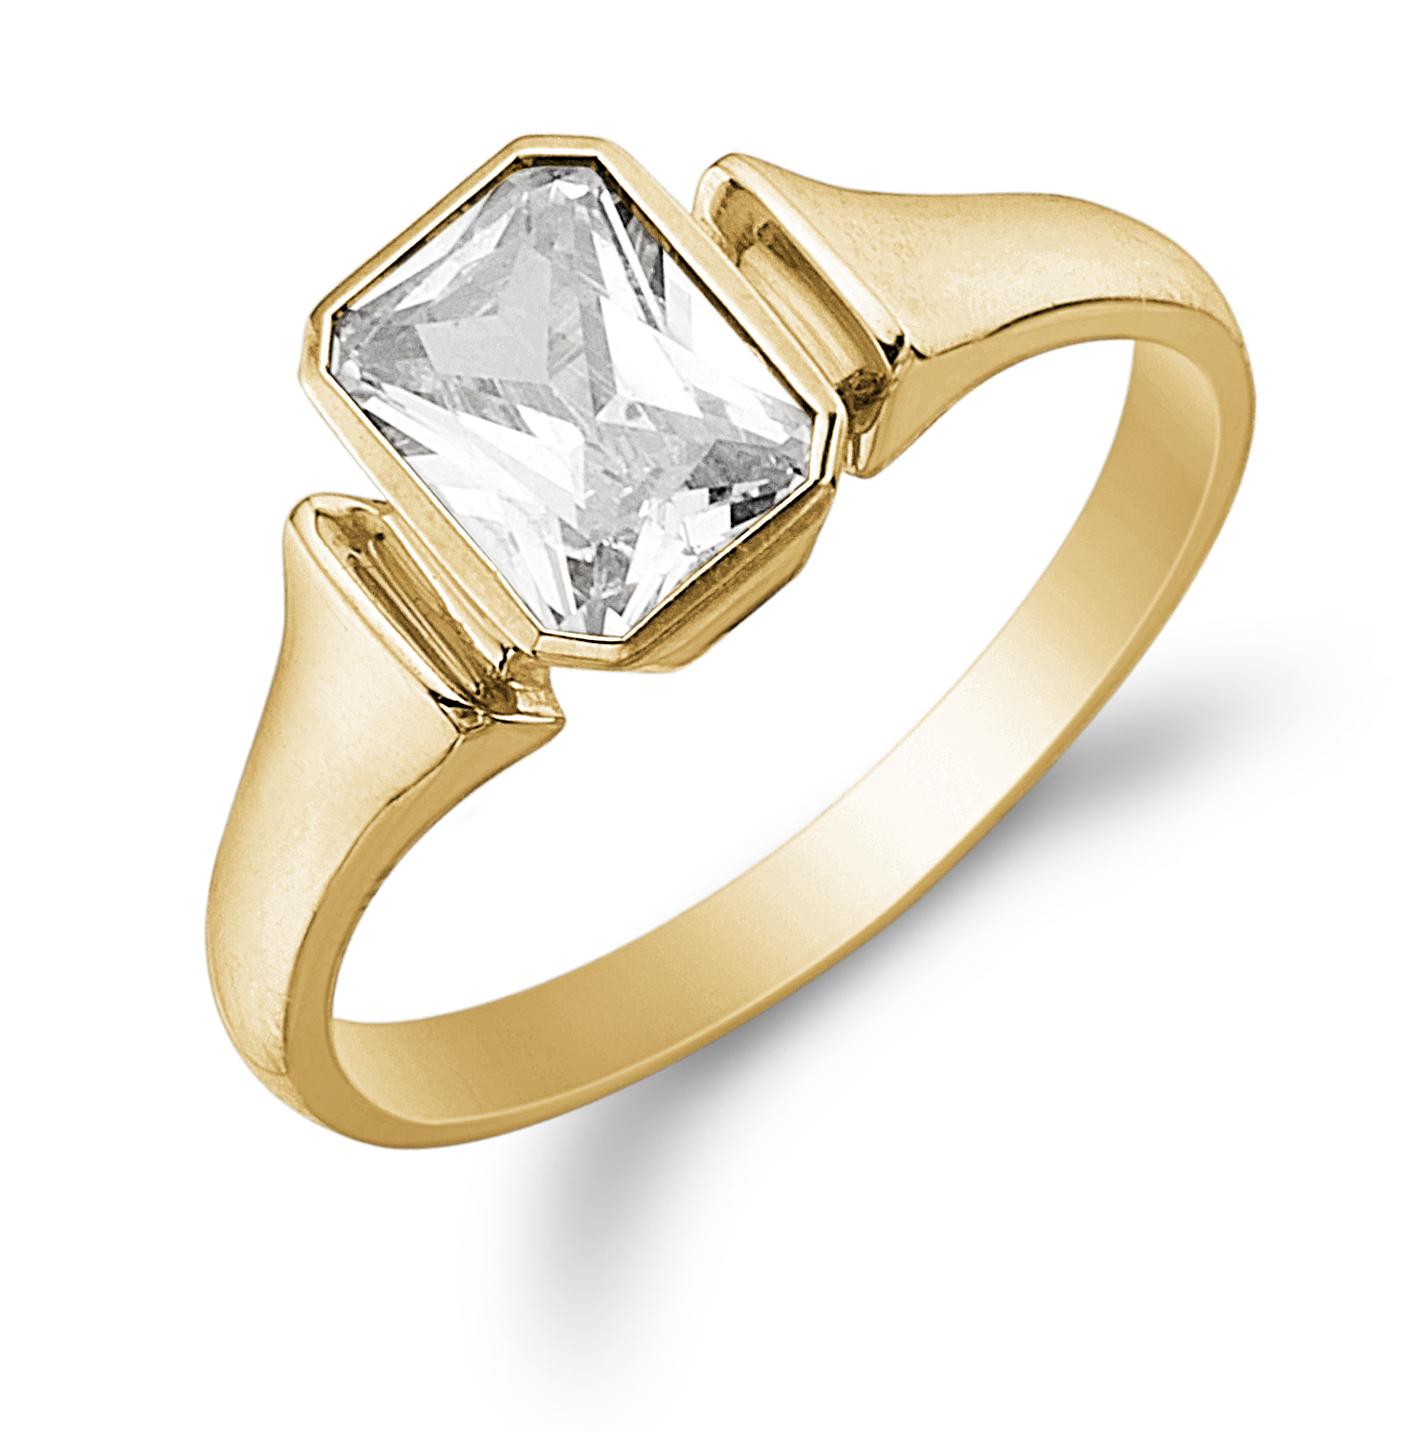 Aagaard 8 kt ring - 08621282-75 Størrelse 50